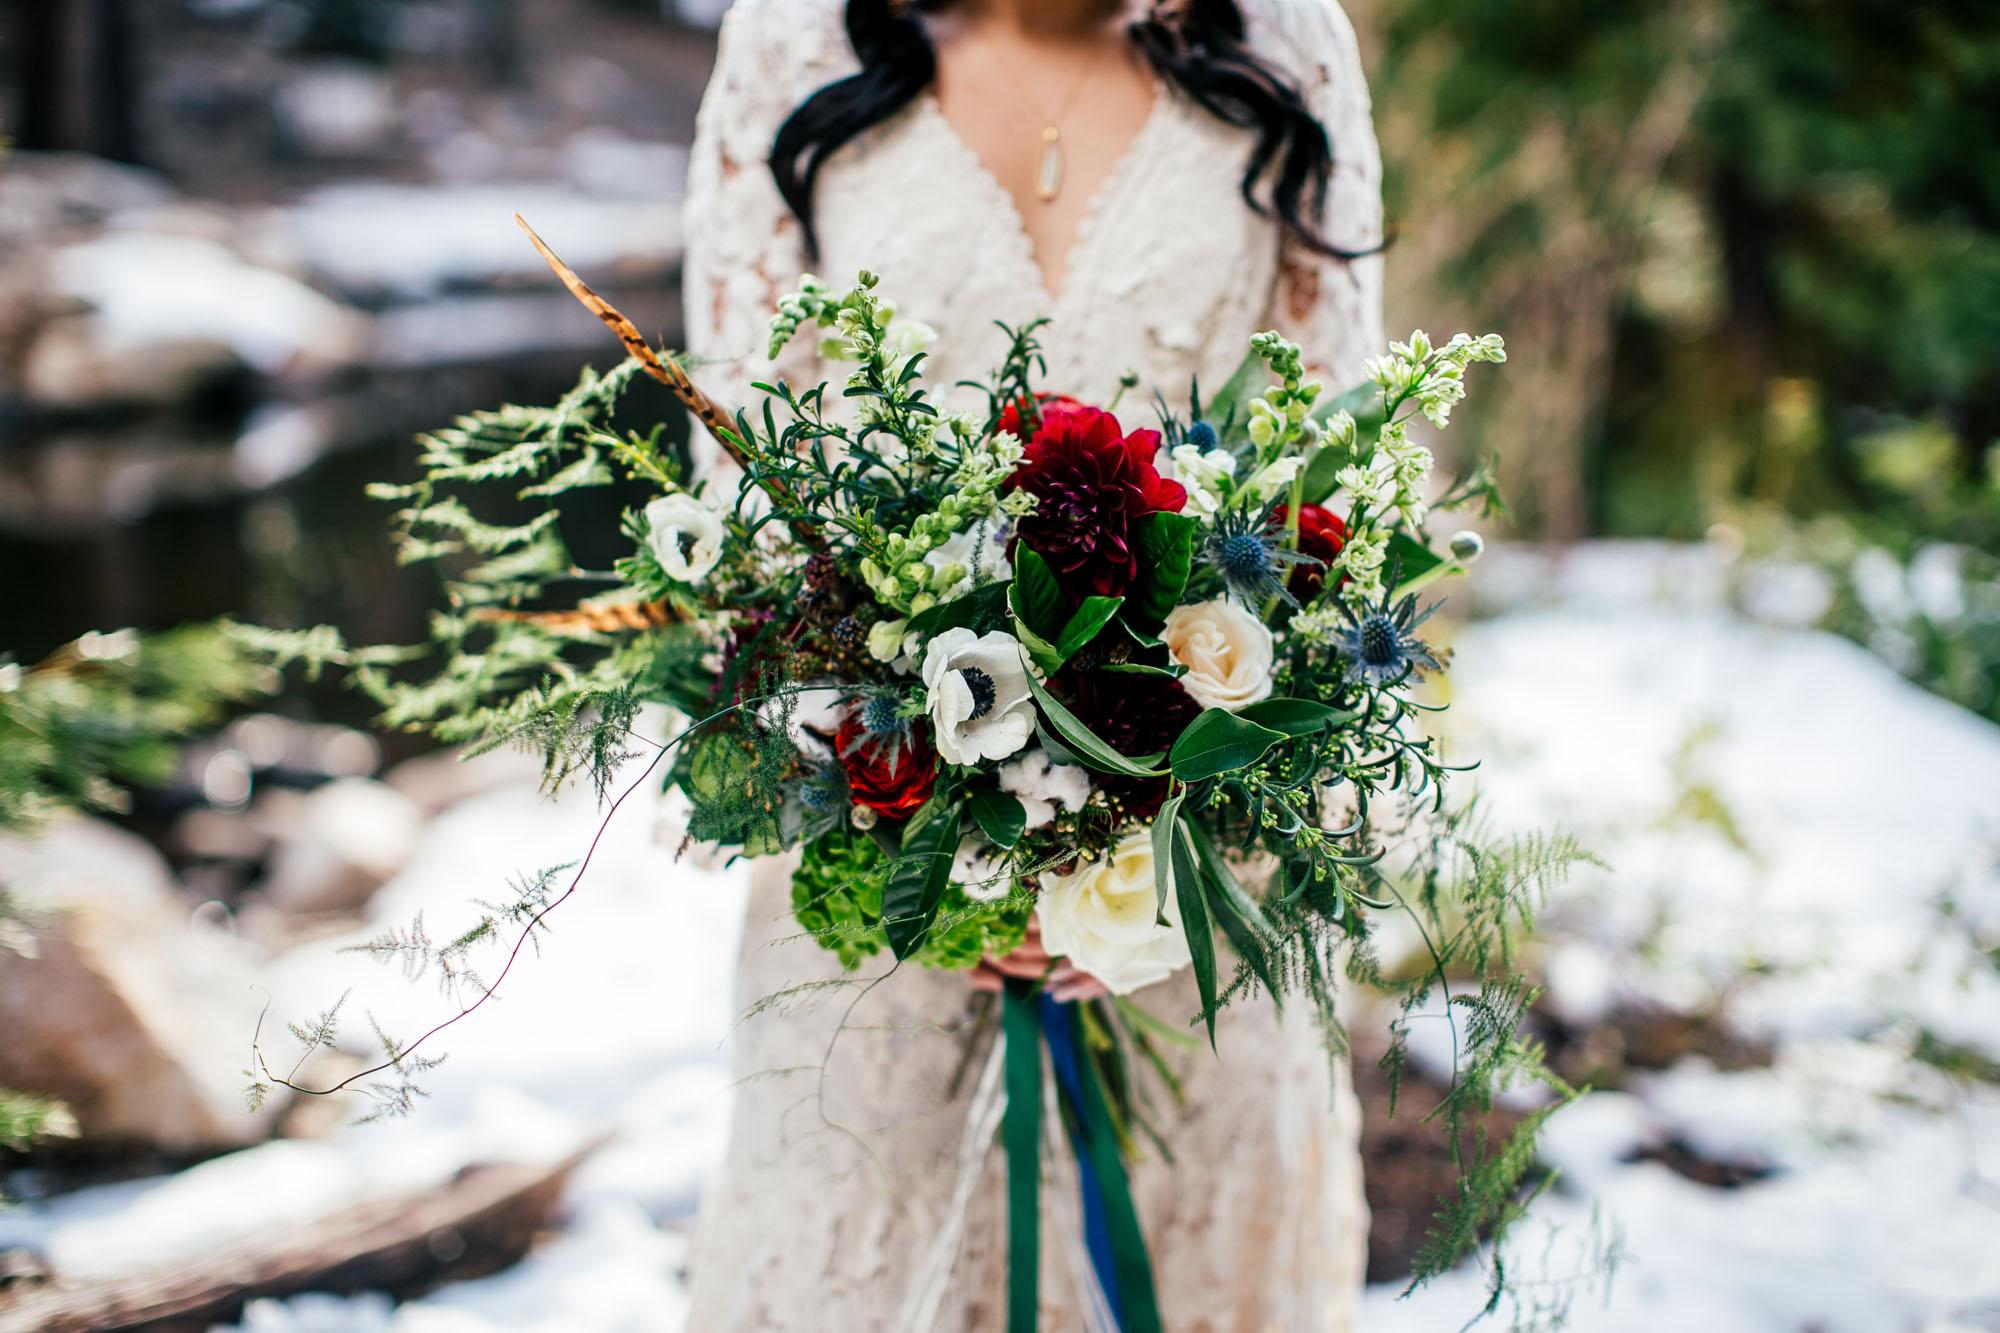 2017.2.16._Big_Bear_Wedding_Sarah_Mack_Photo 55.jpg